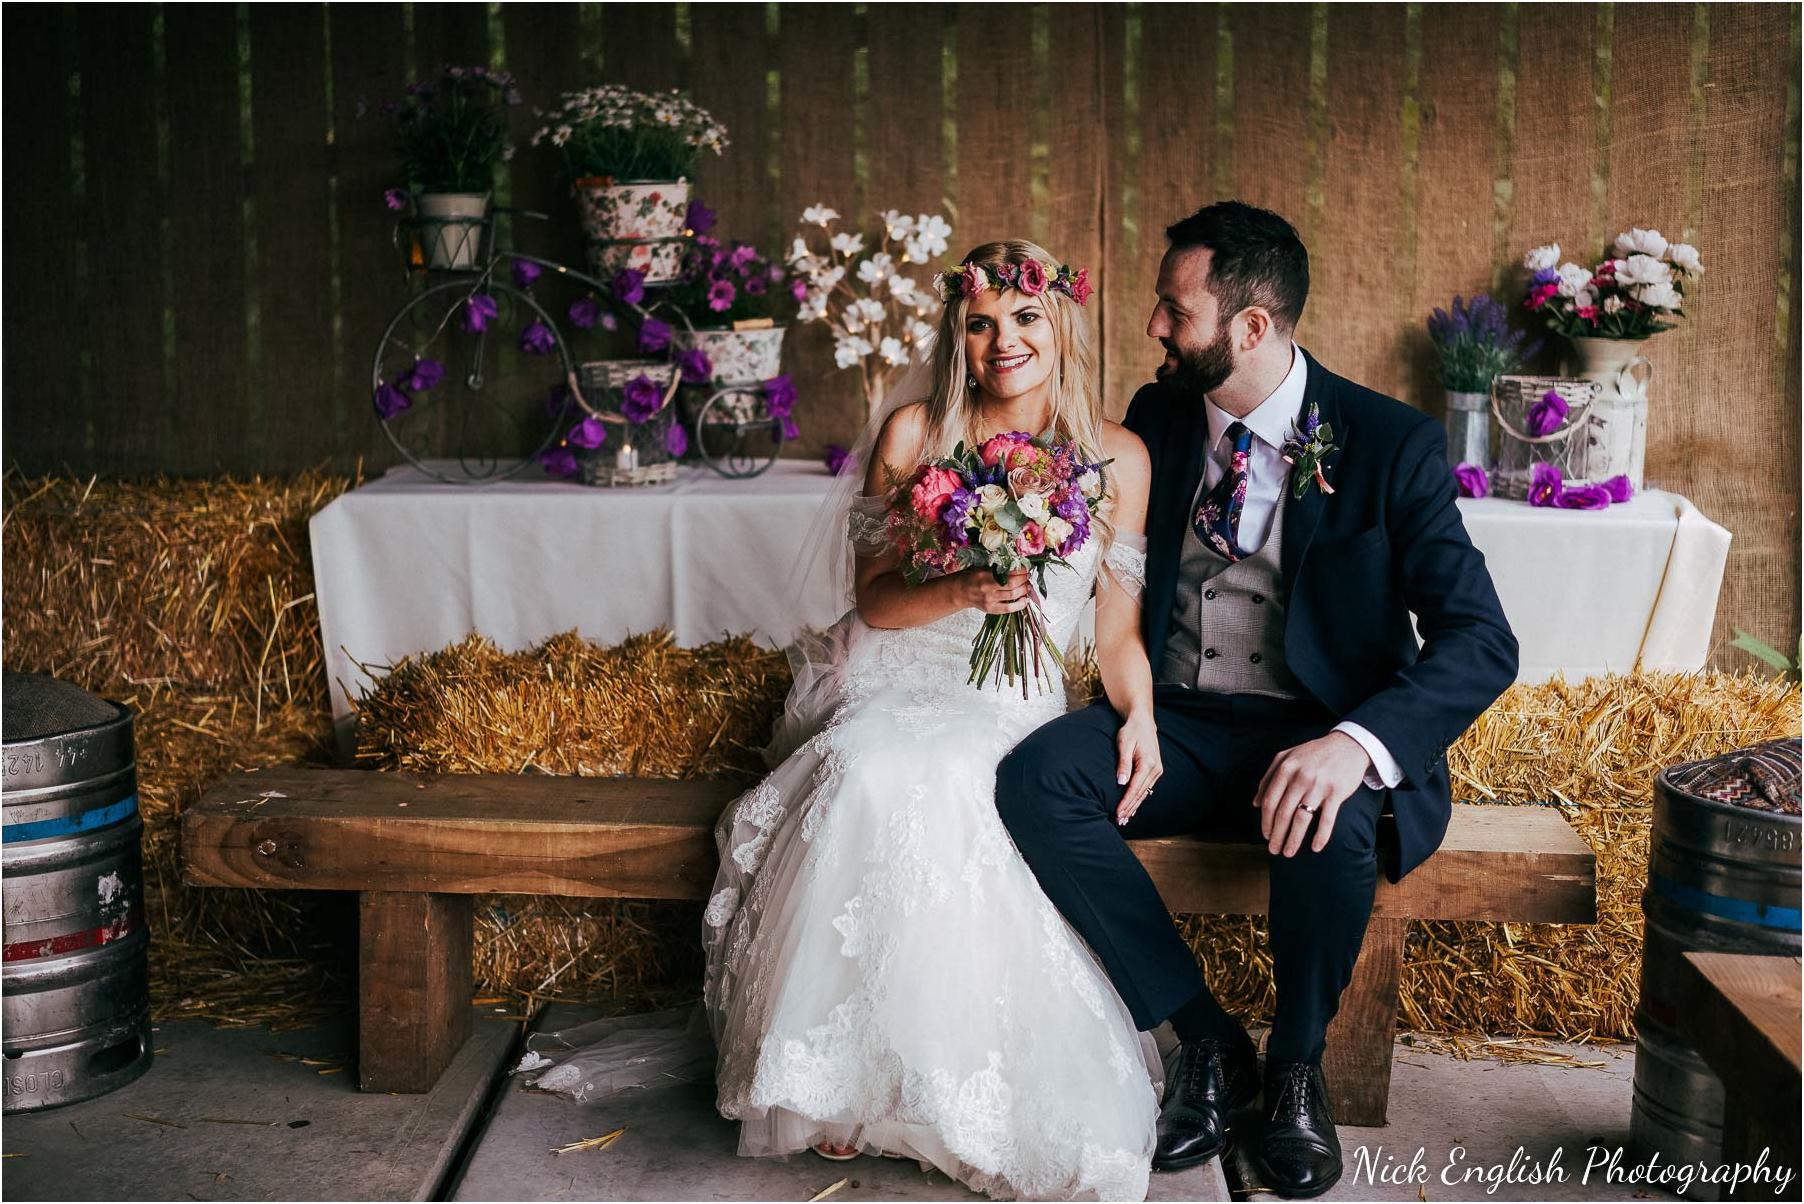 Whitebottom_Farm_Wedding_Manchester_Photograph-65.jpg